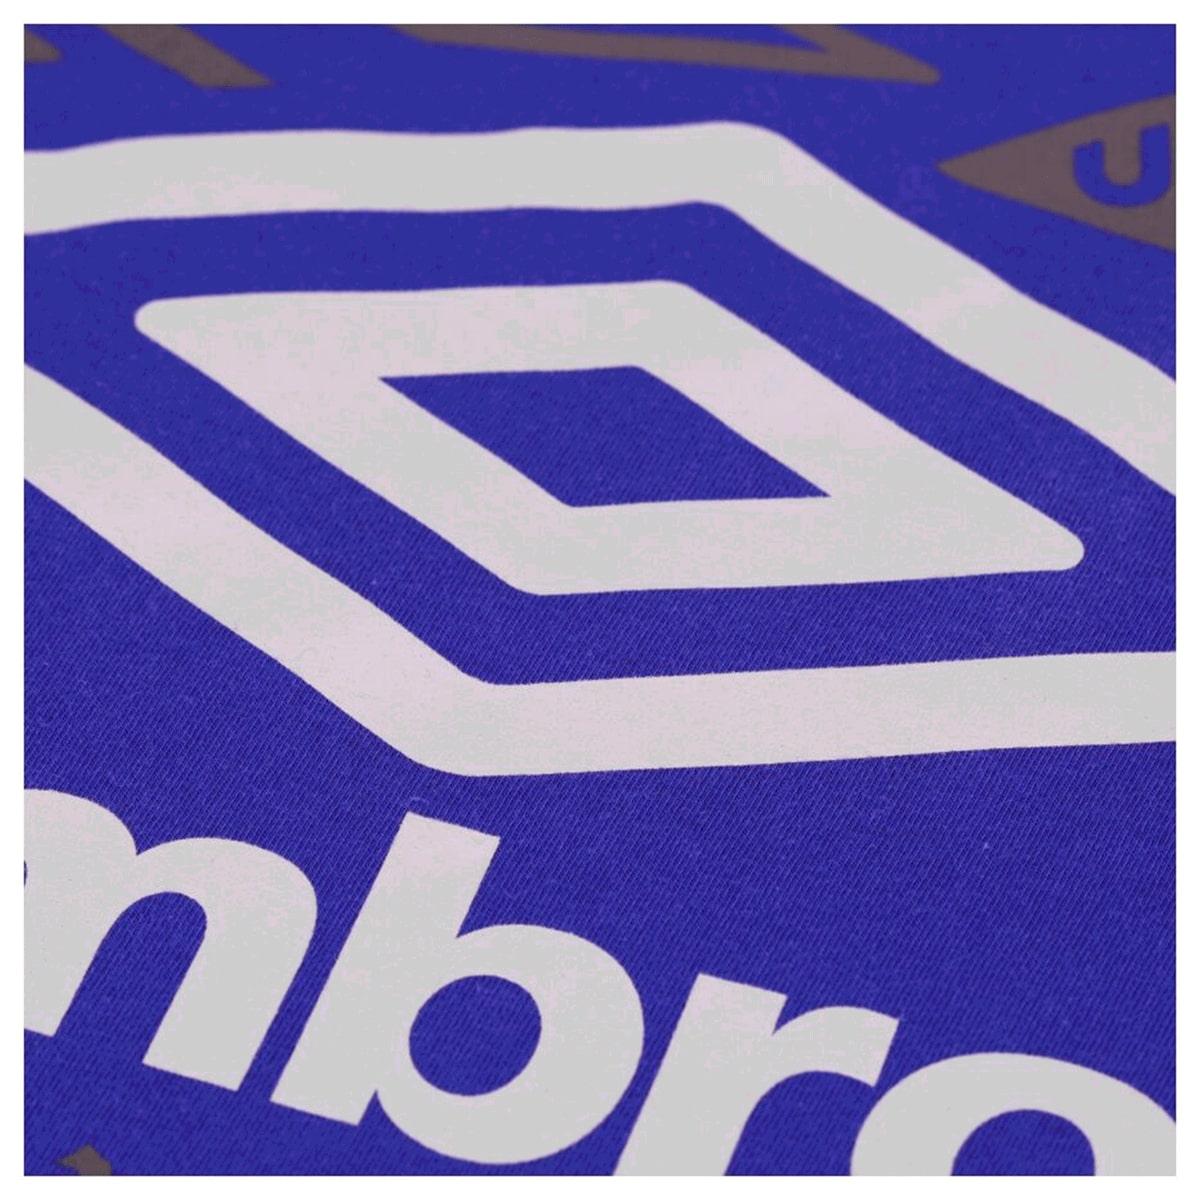 Camiseta Umbro TWR Legacy Classic Masculino Azul